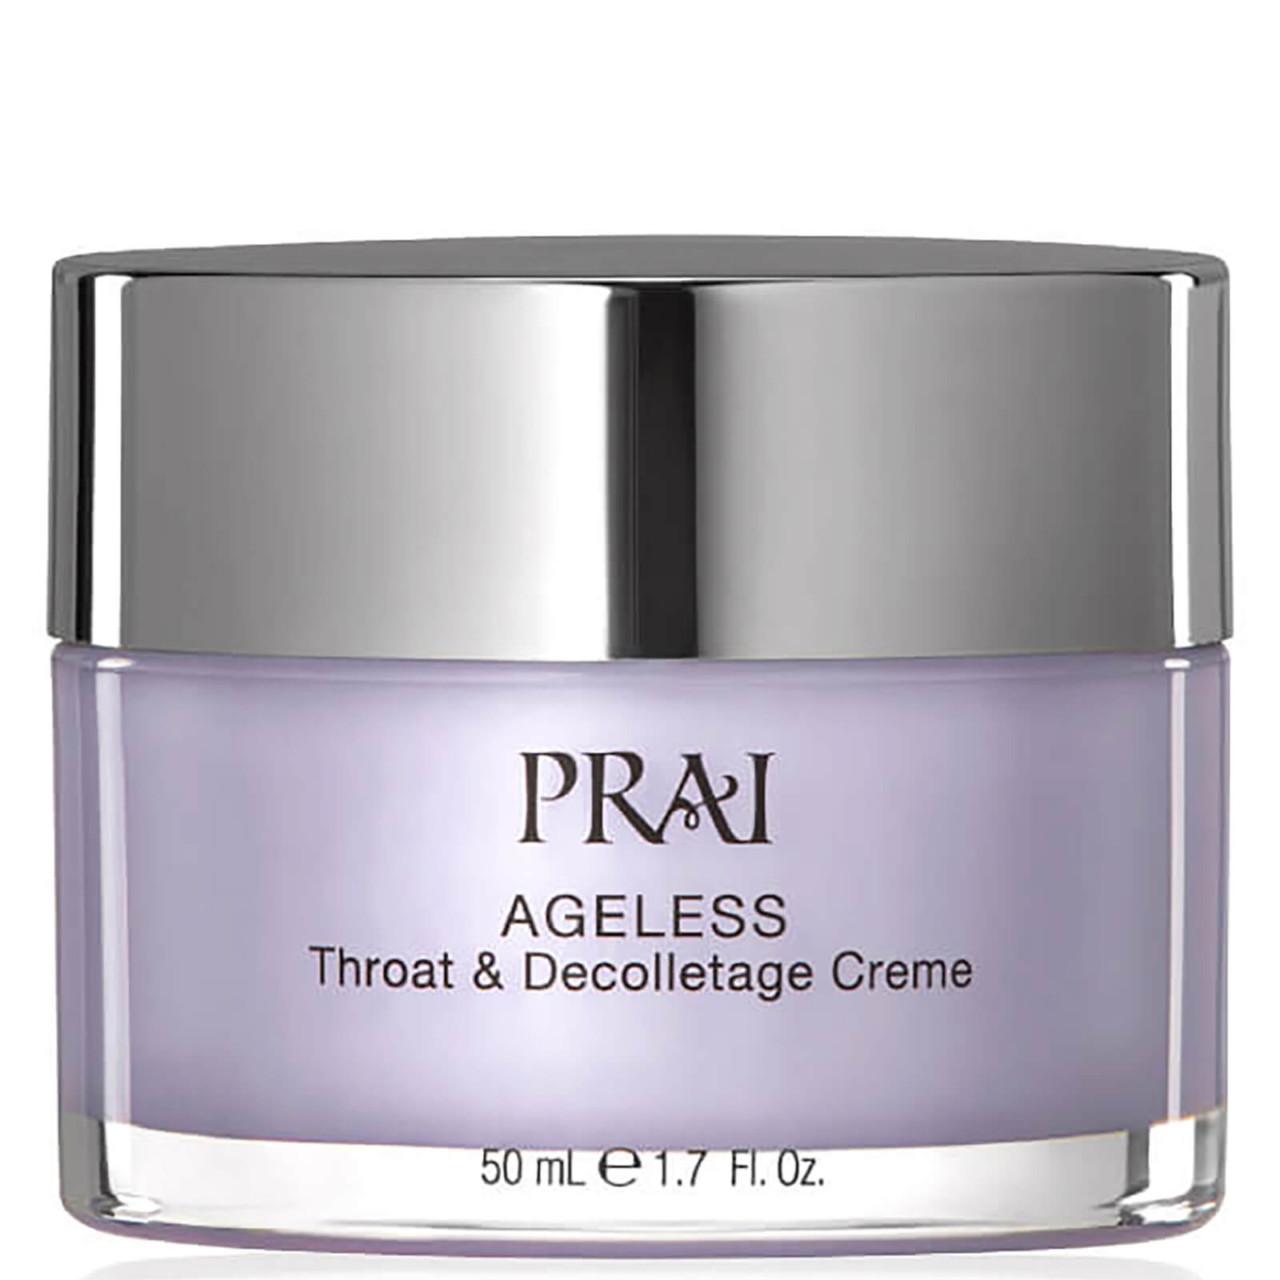 Prai Ageless Throat and Decolletage Night Crème